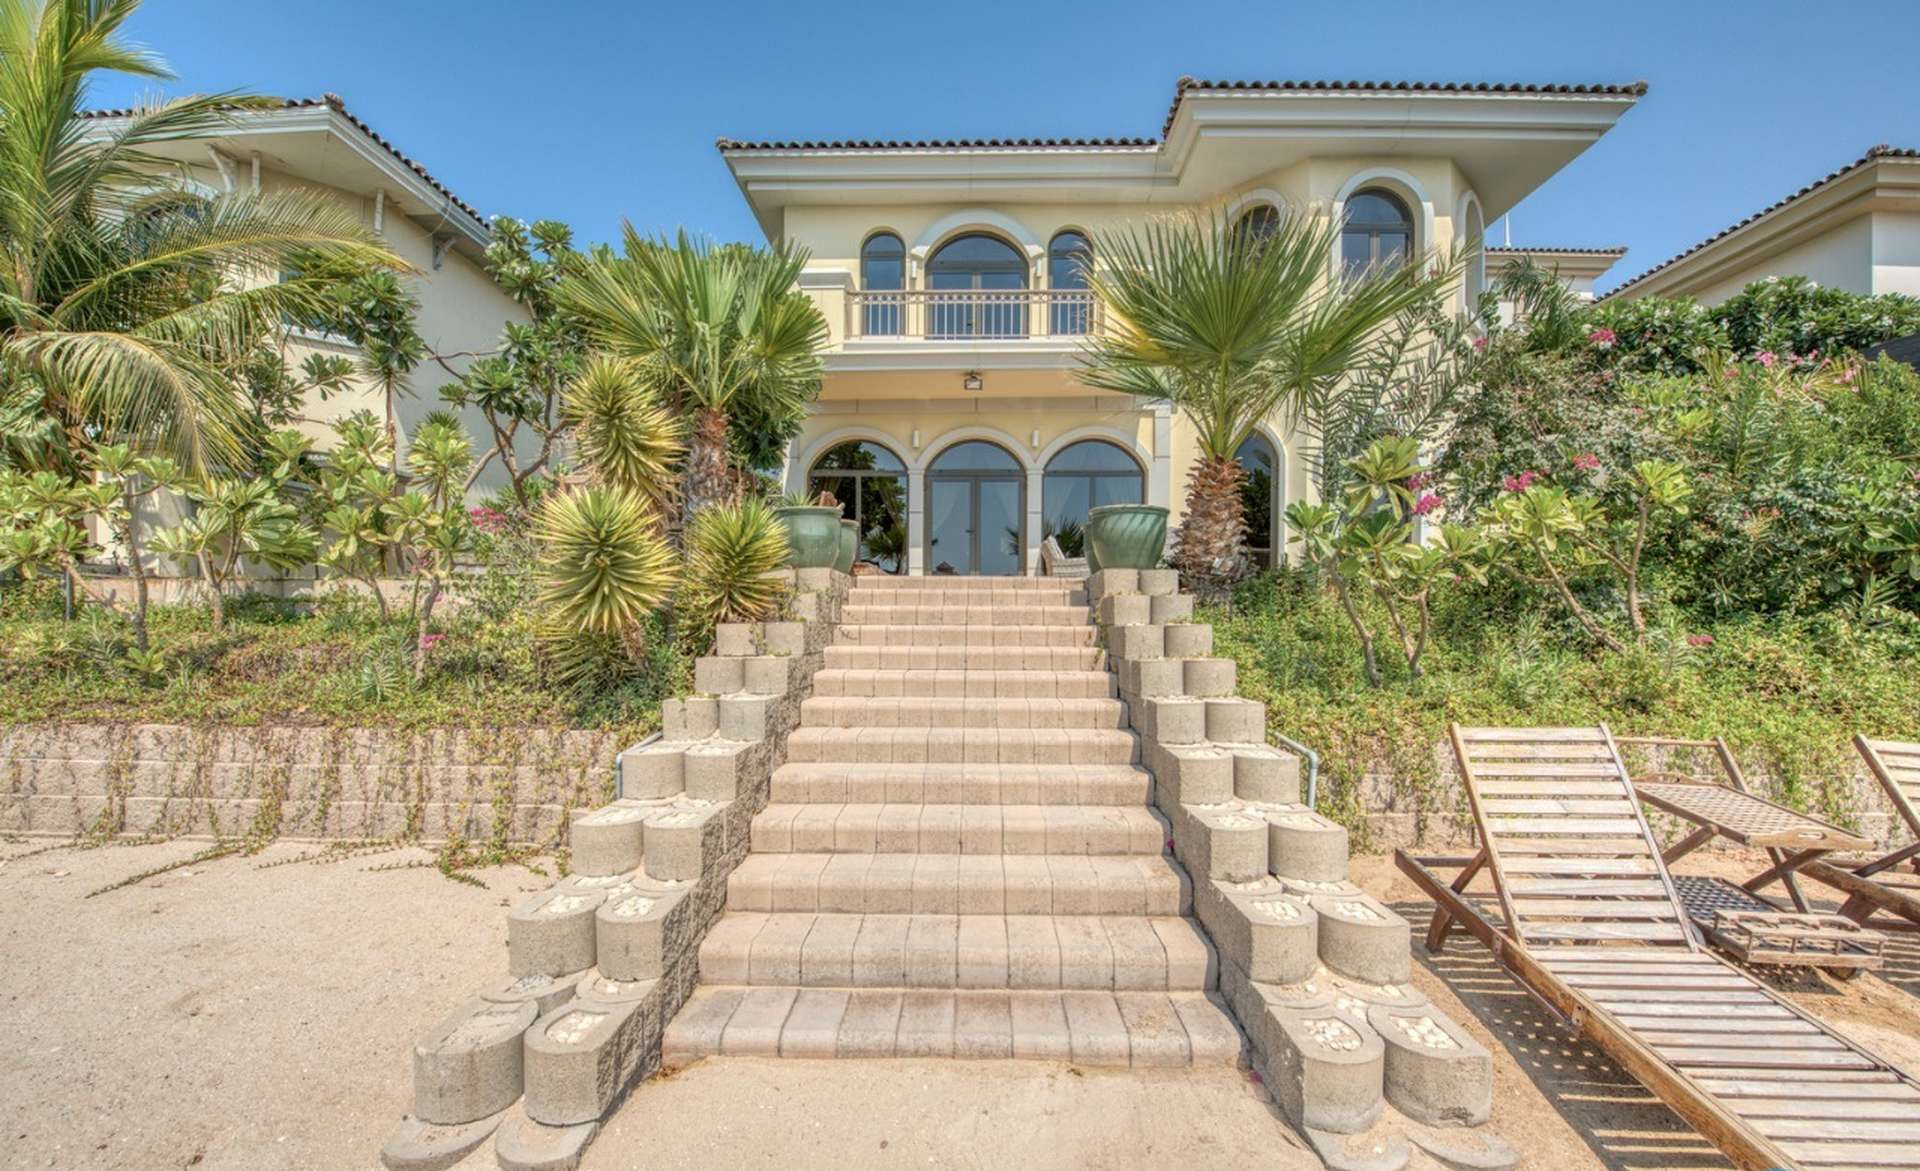 4-bedroom-villa-for-sale-garden_homes-LP03739-2e96ec55c2d74c00